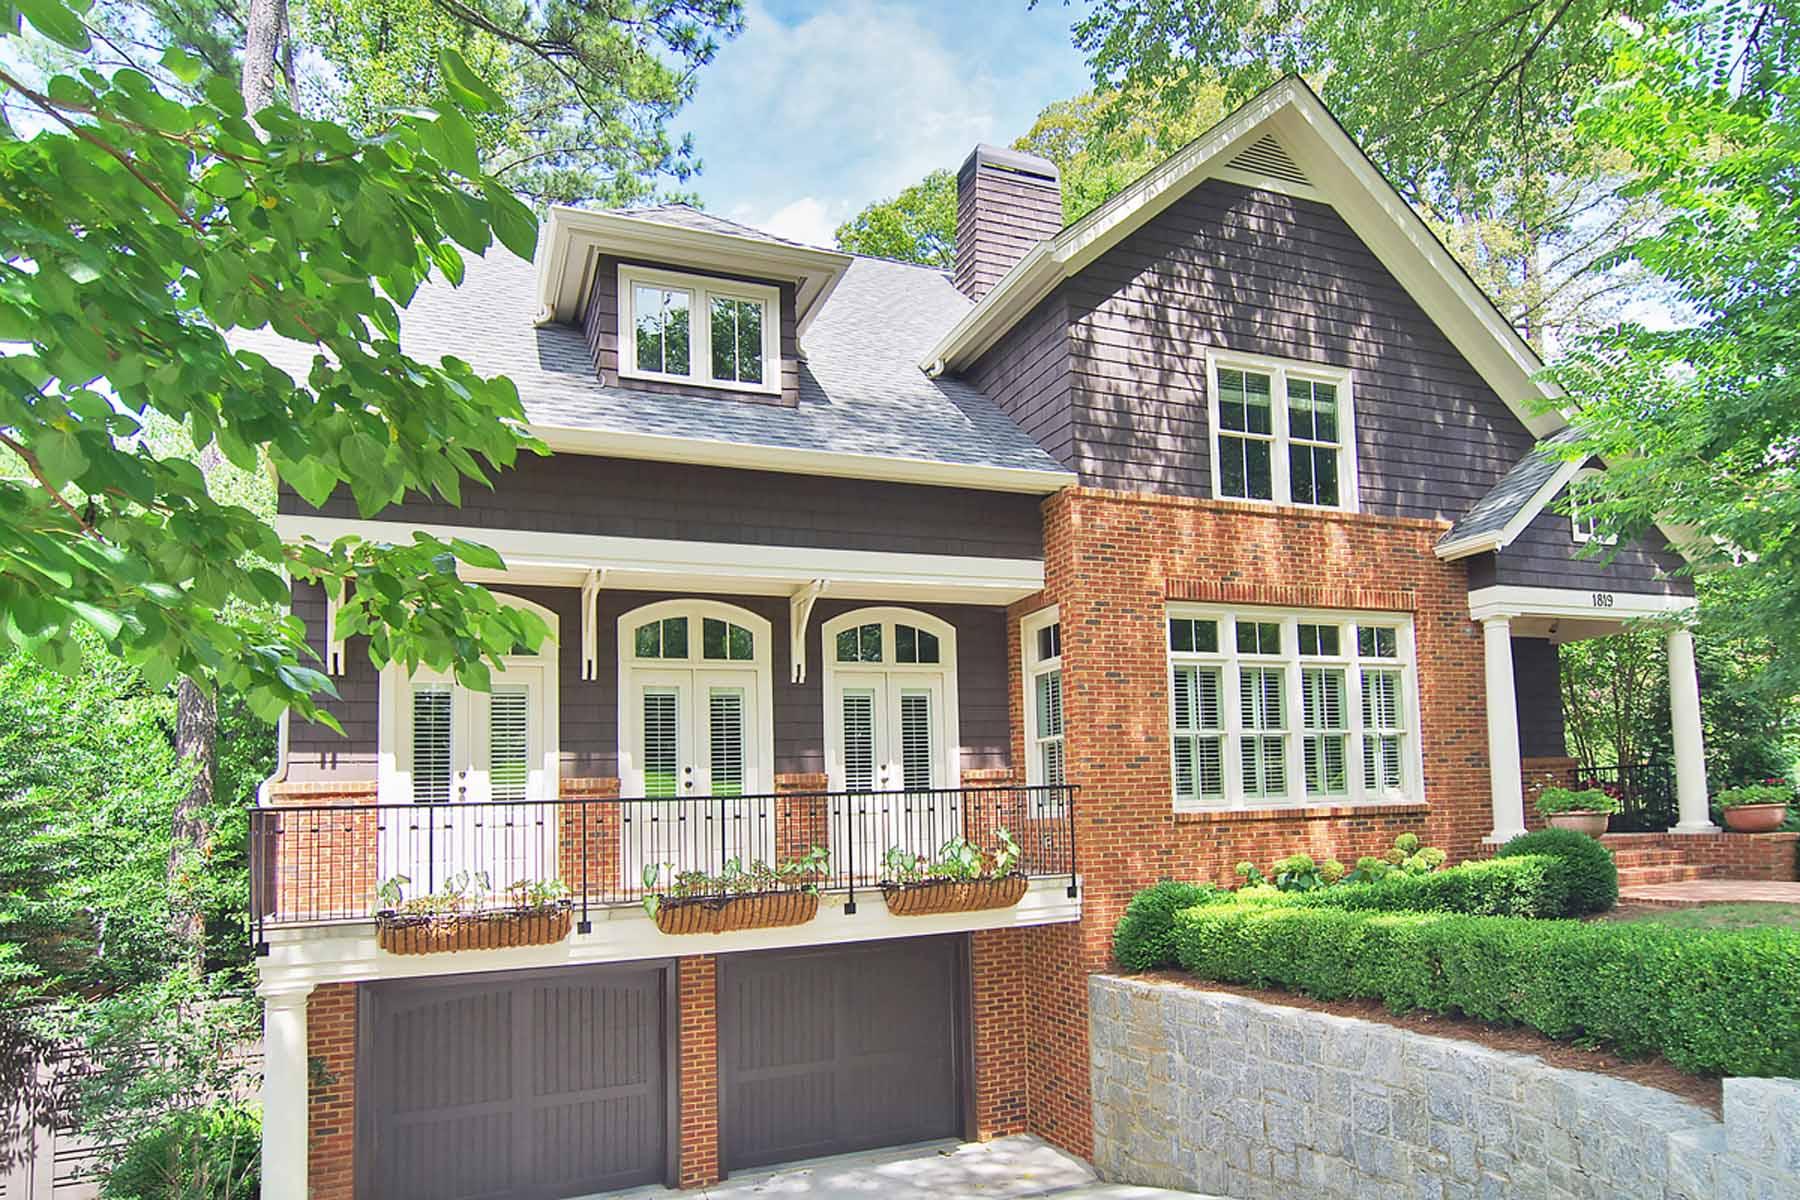 Casa Unifamiliar por un Venta en Stunning Morningside Charmer 1819 Windemere Drive Morningside, Atlanta, Georgia 30324 Estados Unidos